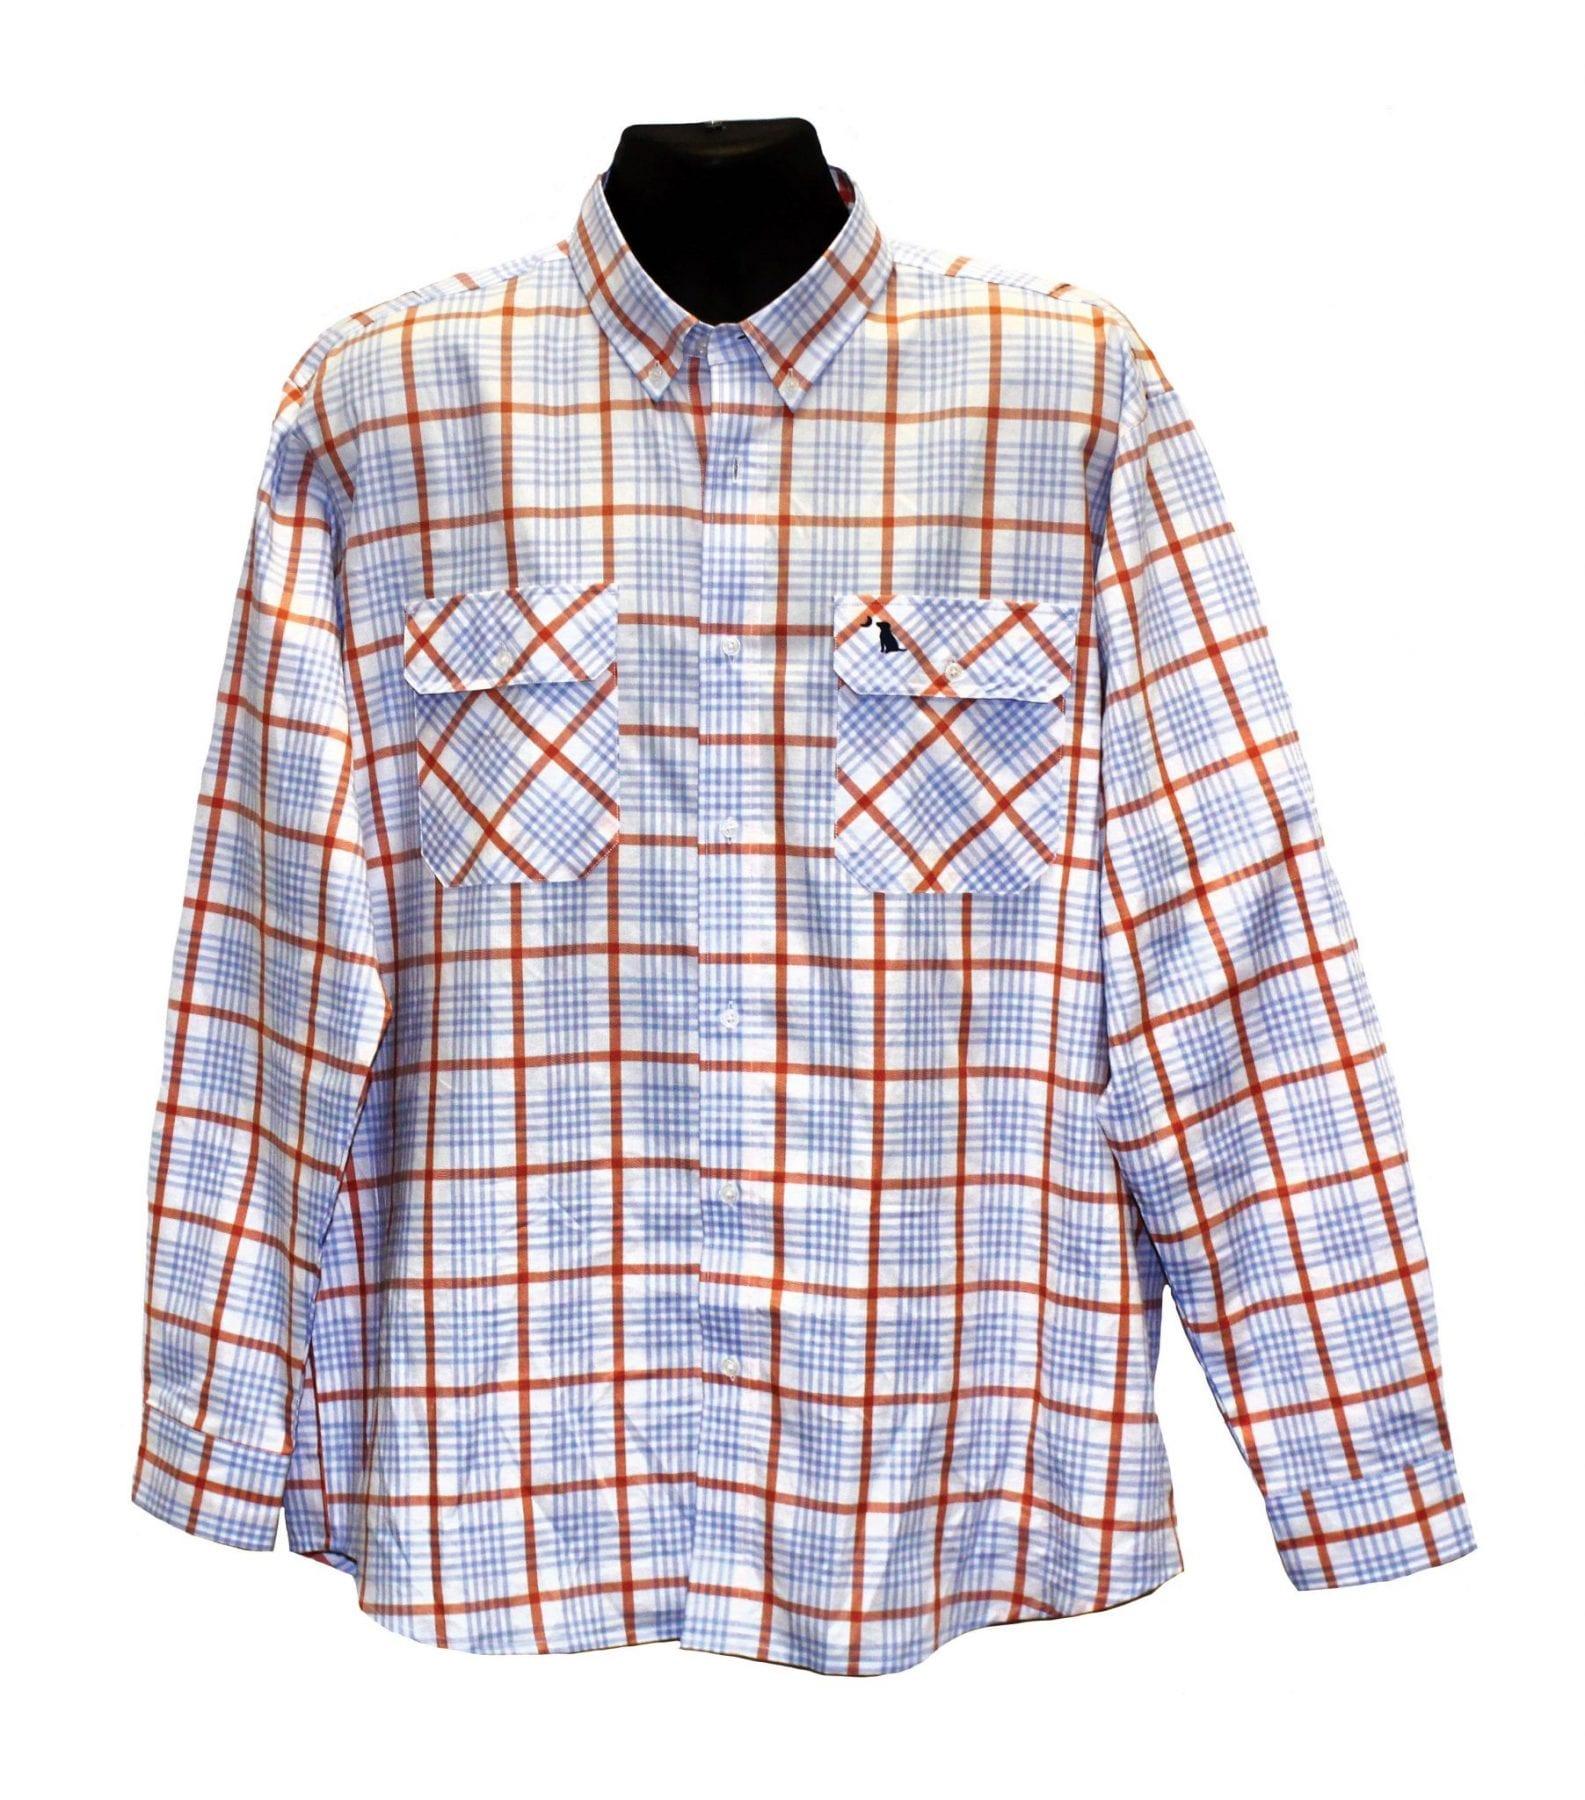 magellan angler fit shirt - HD1803×2048